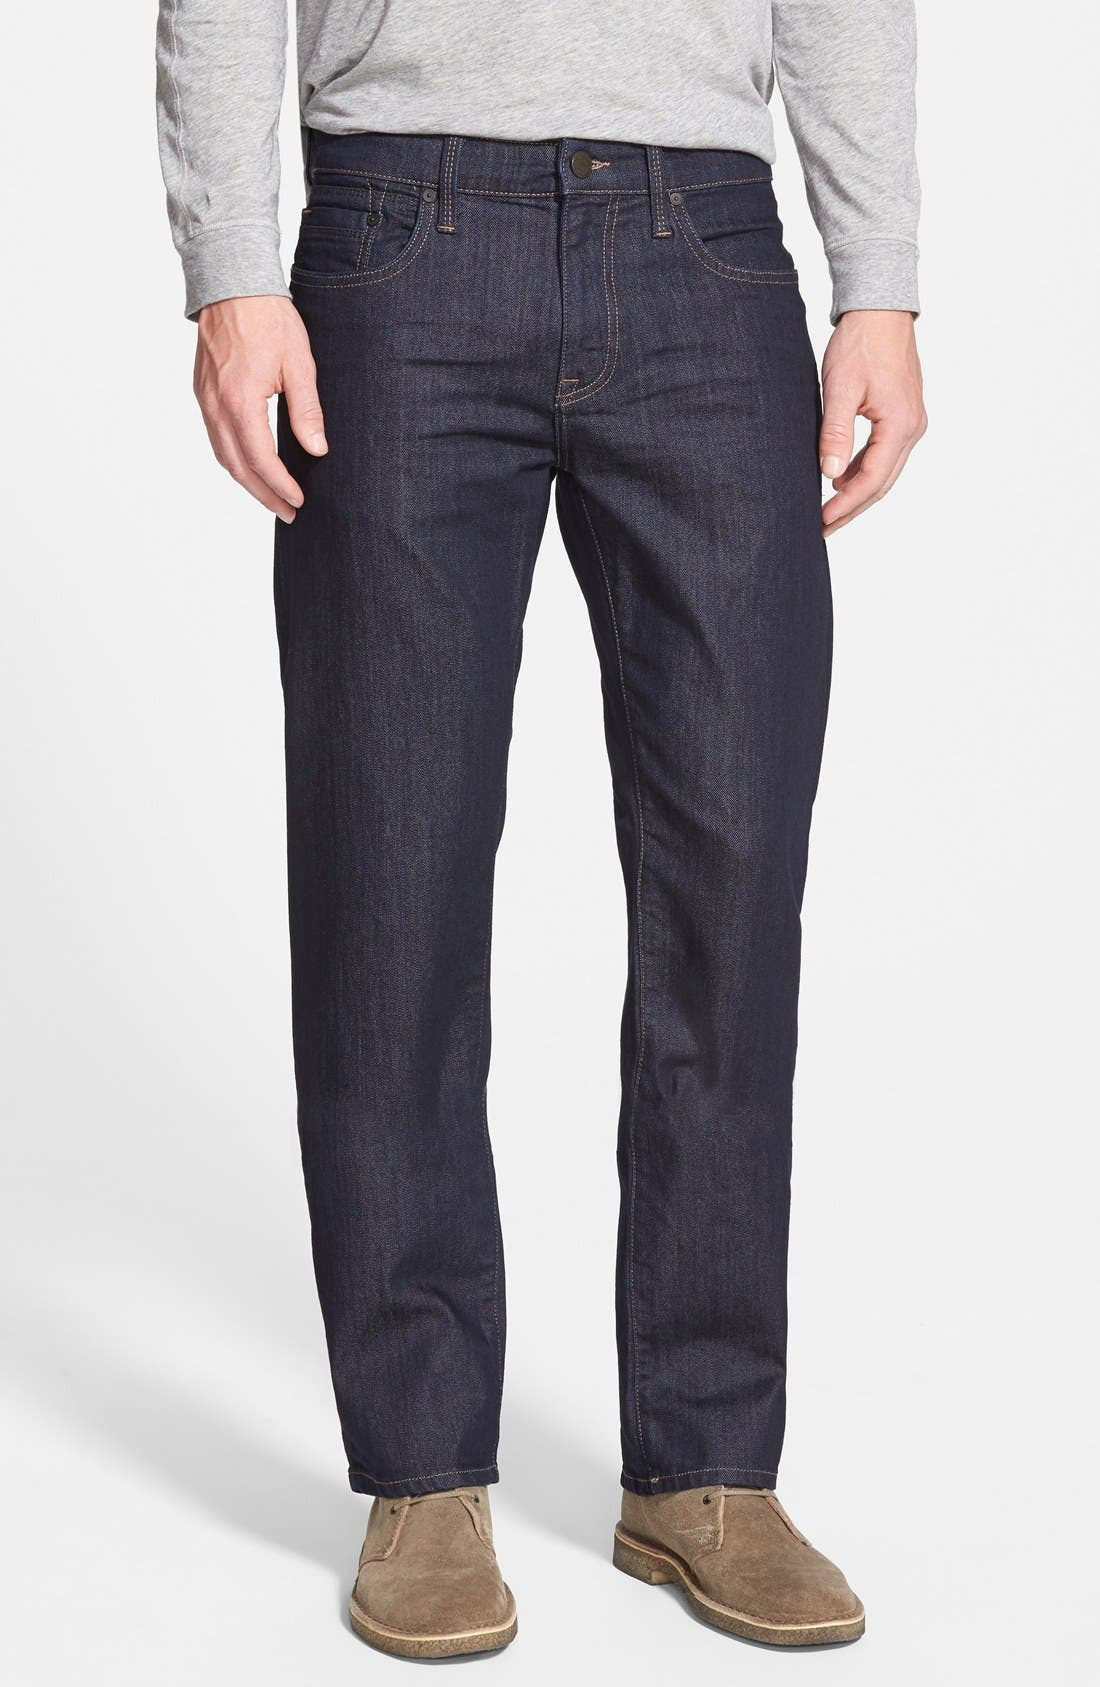 Alternate Image 1 Selected - Mavi Jeans Zach Straight Leg Jeans (Rinse Williamsburg) (Regular & Tall)